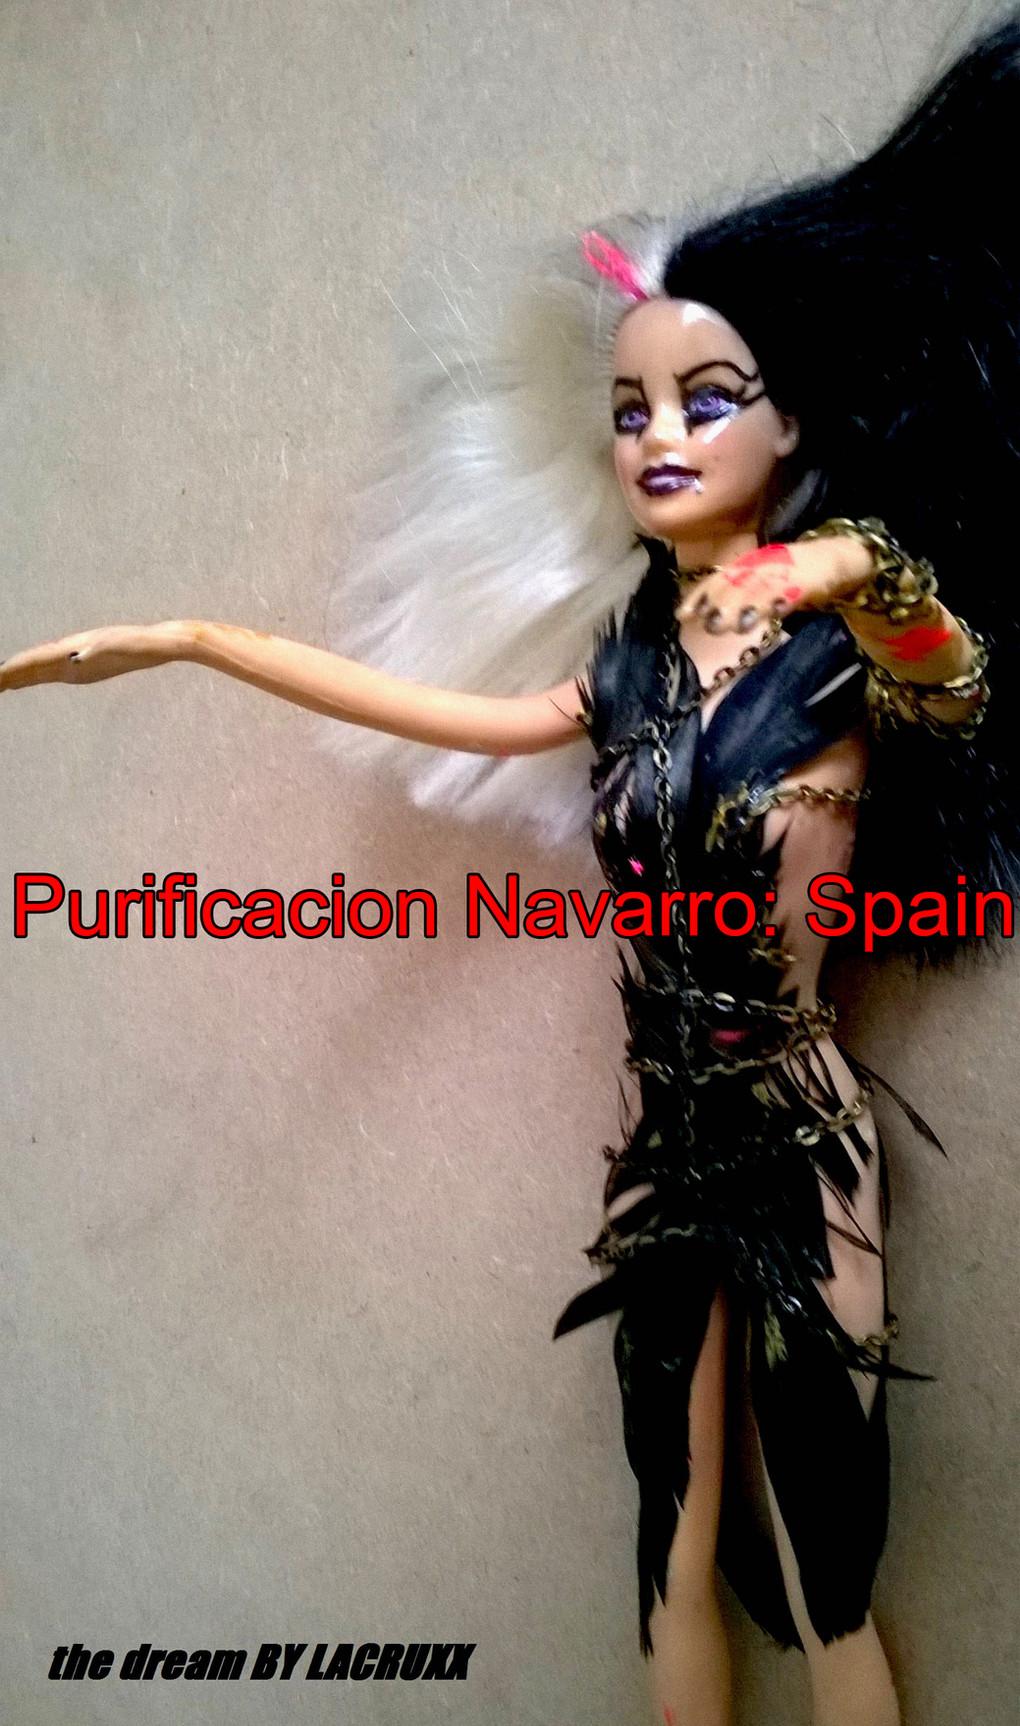 Purificacion Navarro: Spain/by black dog bone